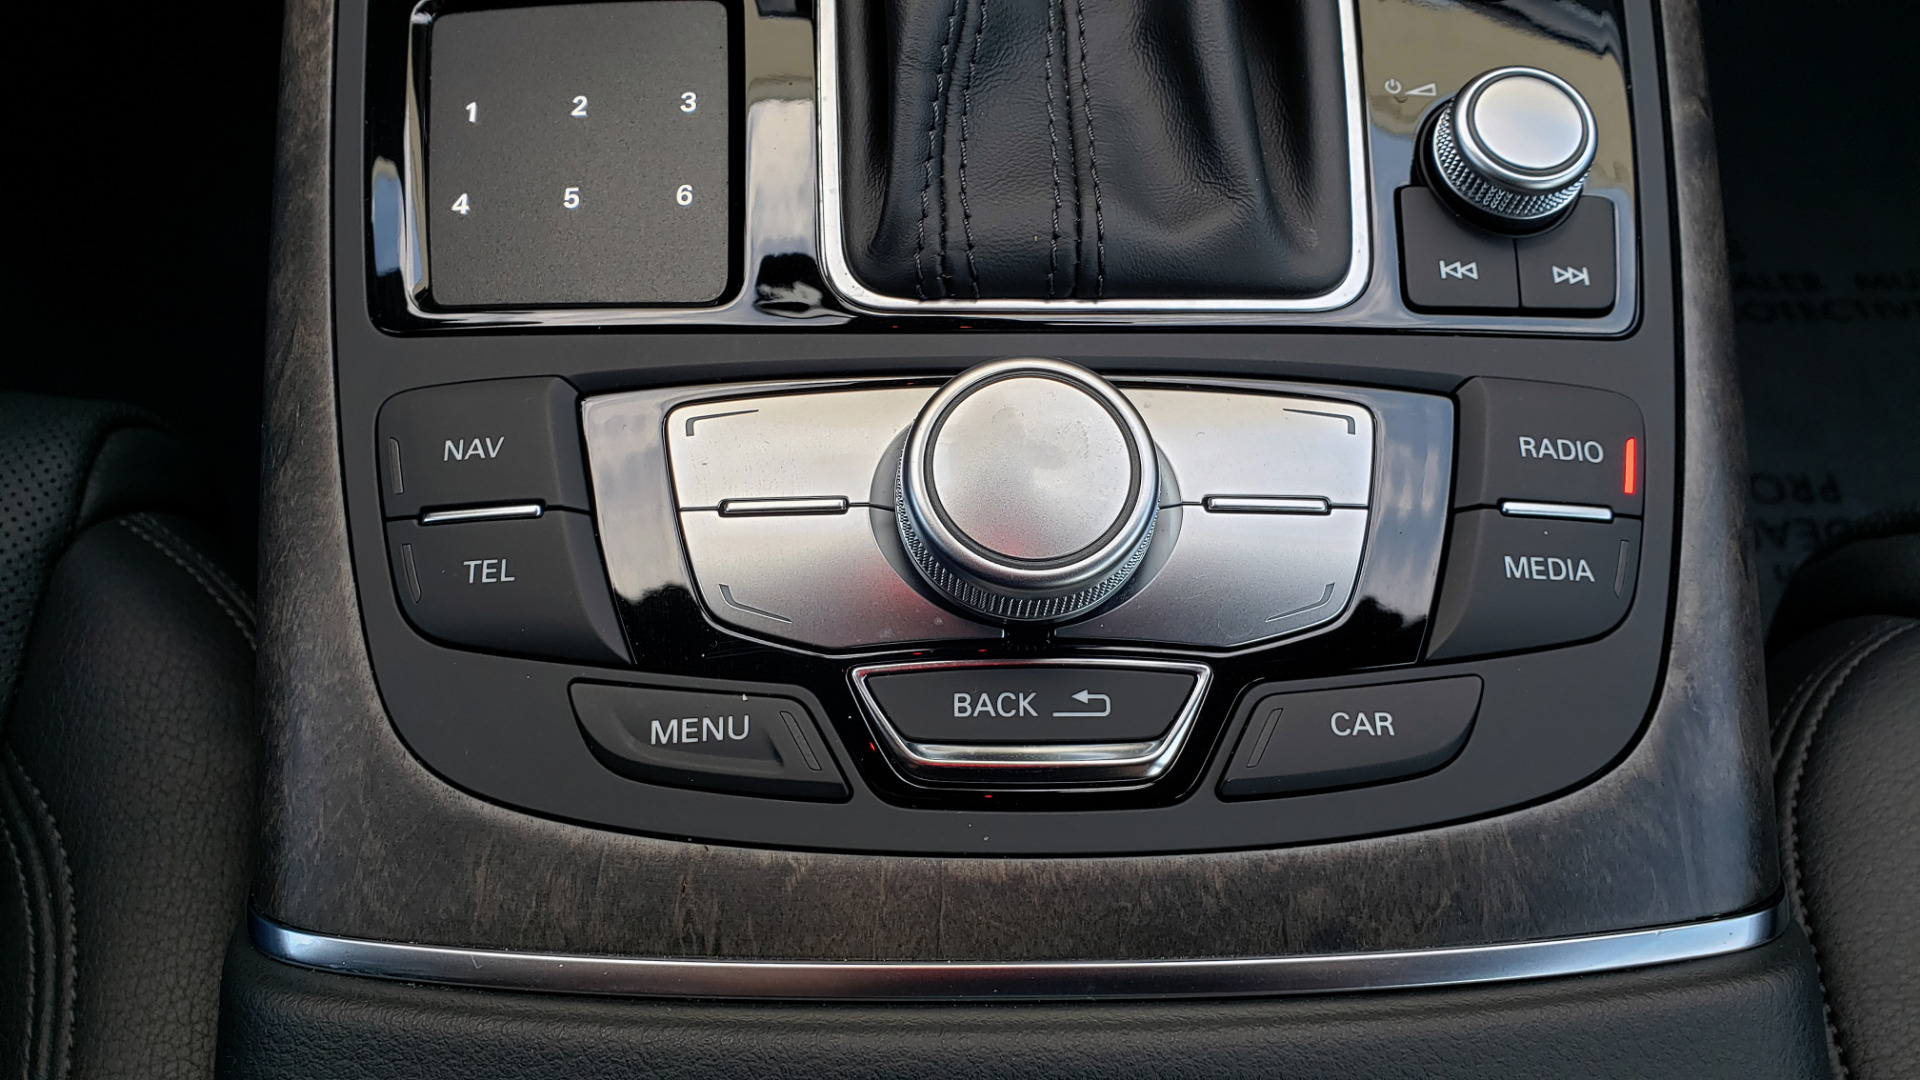 Used 2017 Audi A7 PRESTIGE / DRVR ASST / S-LINE SPORT / NAV / REARVIEW for sale Sold at Formula Imports in Charlotte NC 28227 49